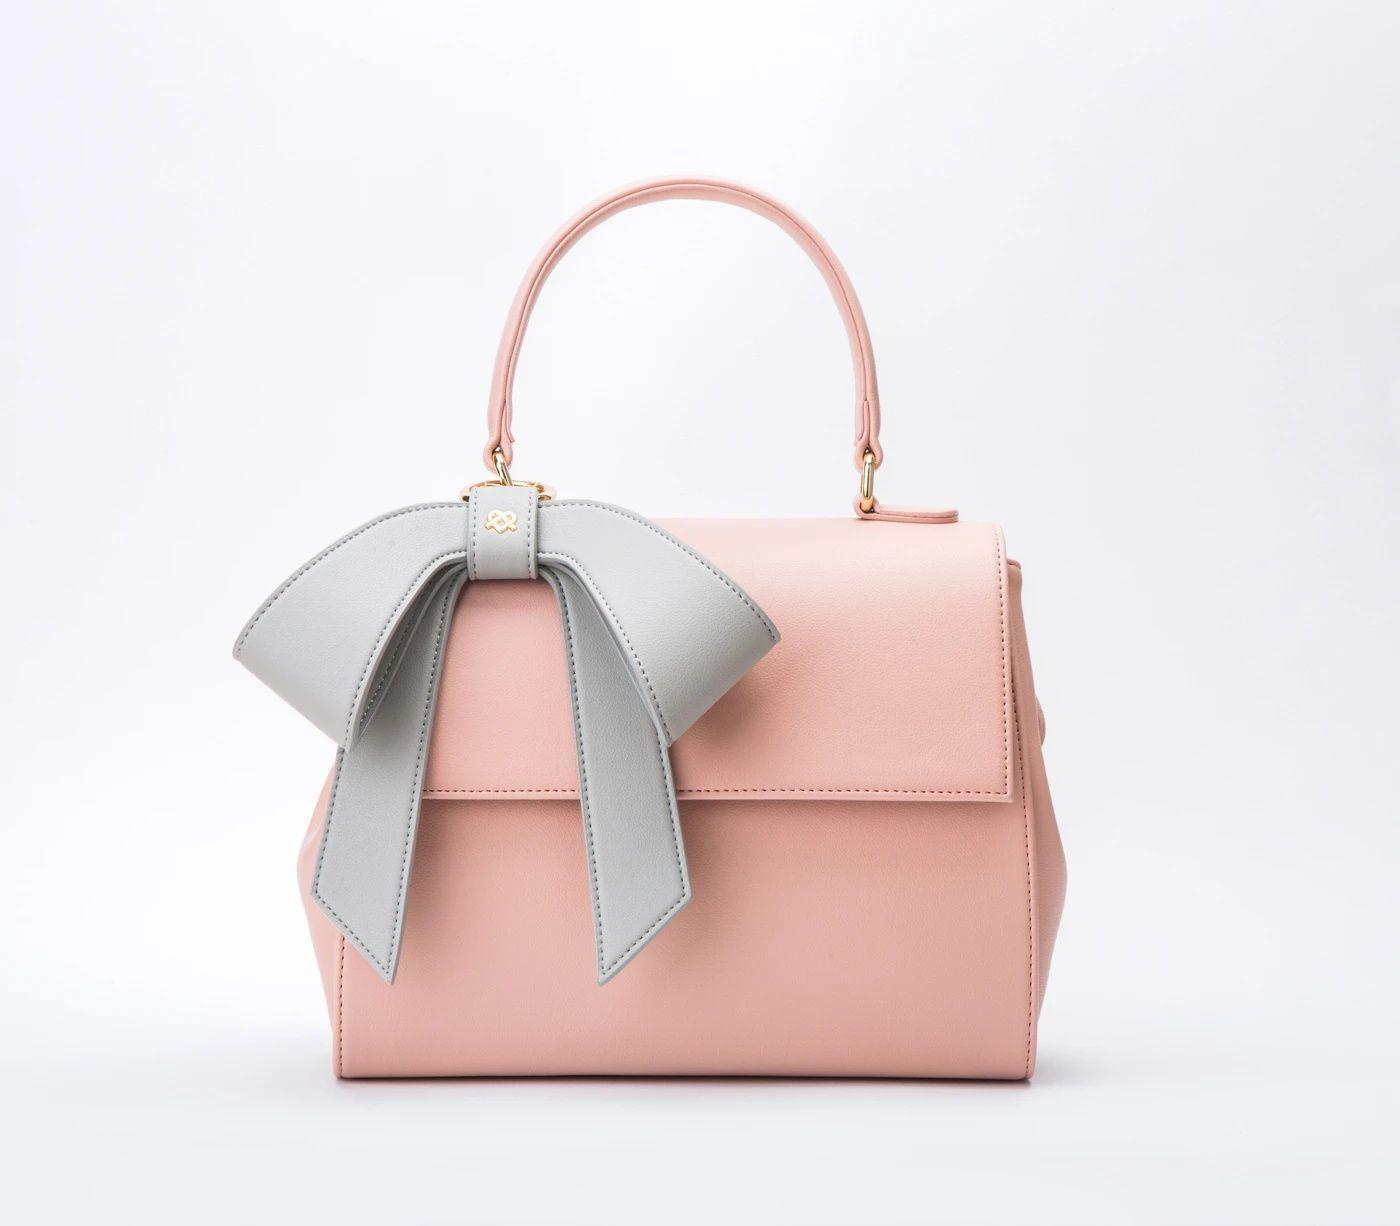 Vegan Leather Pink Cottontail Purse Gunas New York In 2020 Vegan Leather Shoulder Bag Vegan Leather Bag Vegan Bags